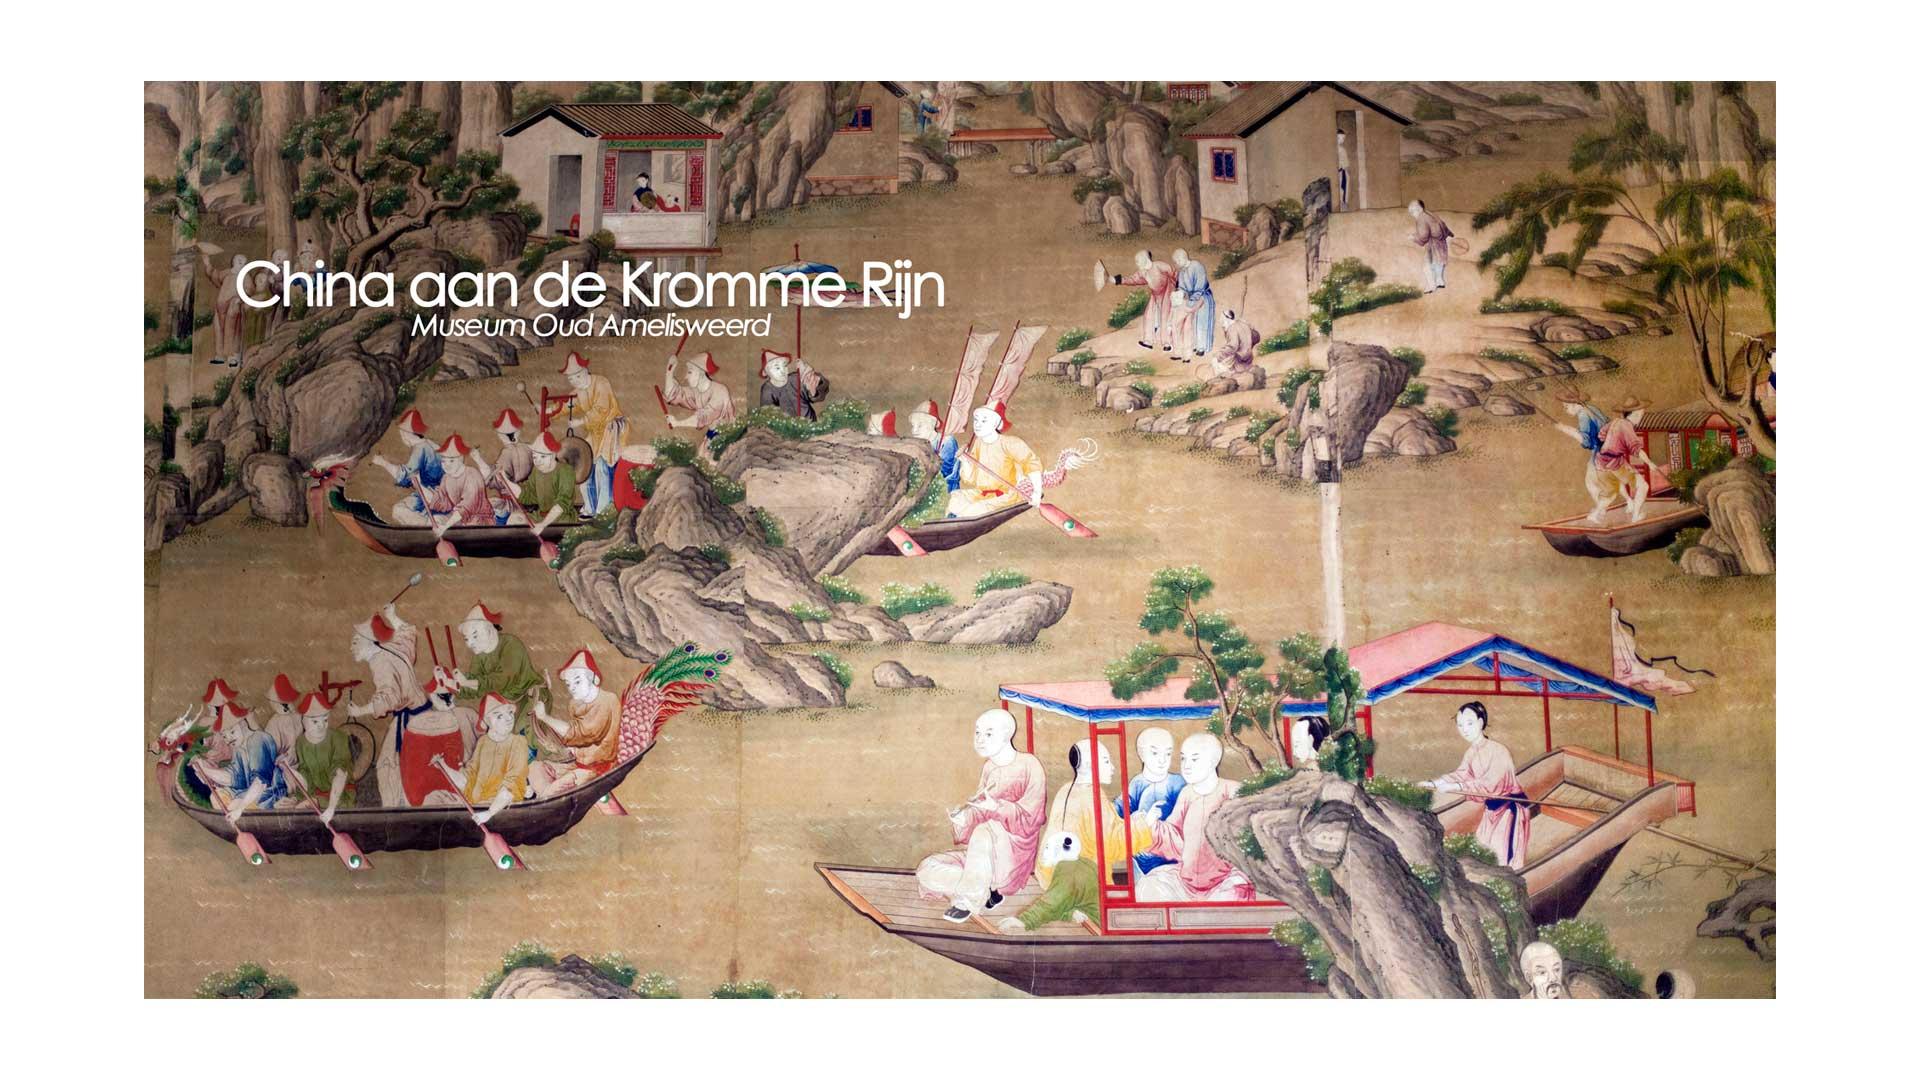 China-aan-de-Kromme-Rijn-1920x1080-V2